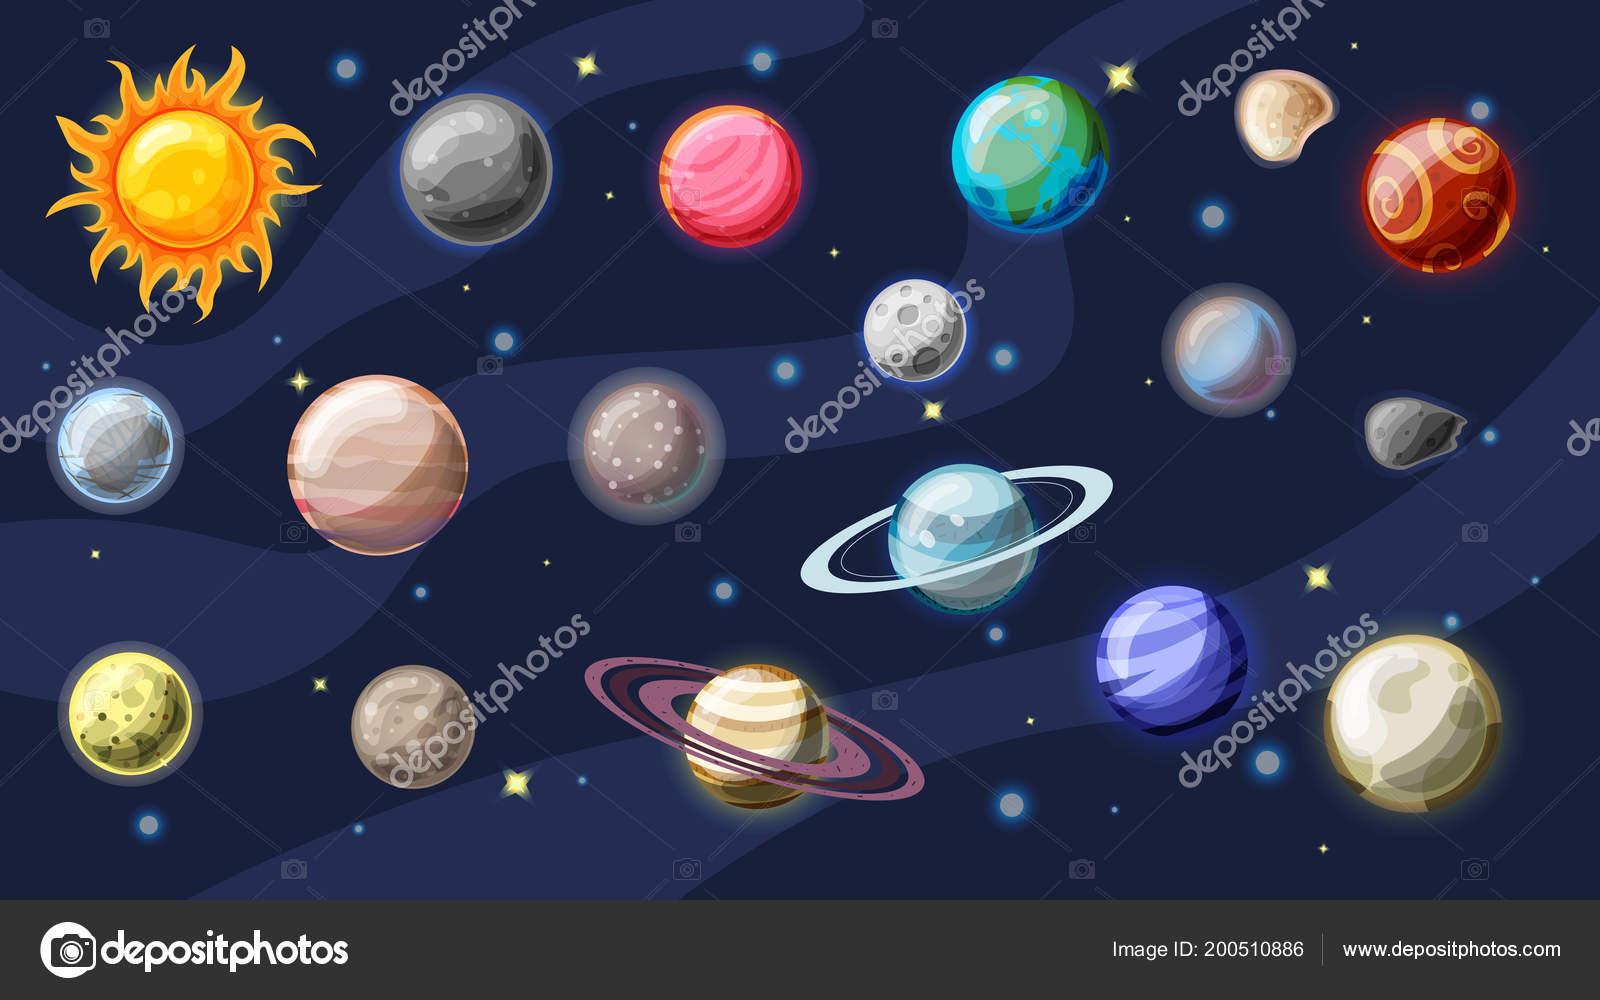 Slunecni Soustave Vektor Kreslene Kolekce Planety Mesice Zeme